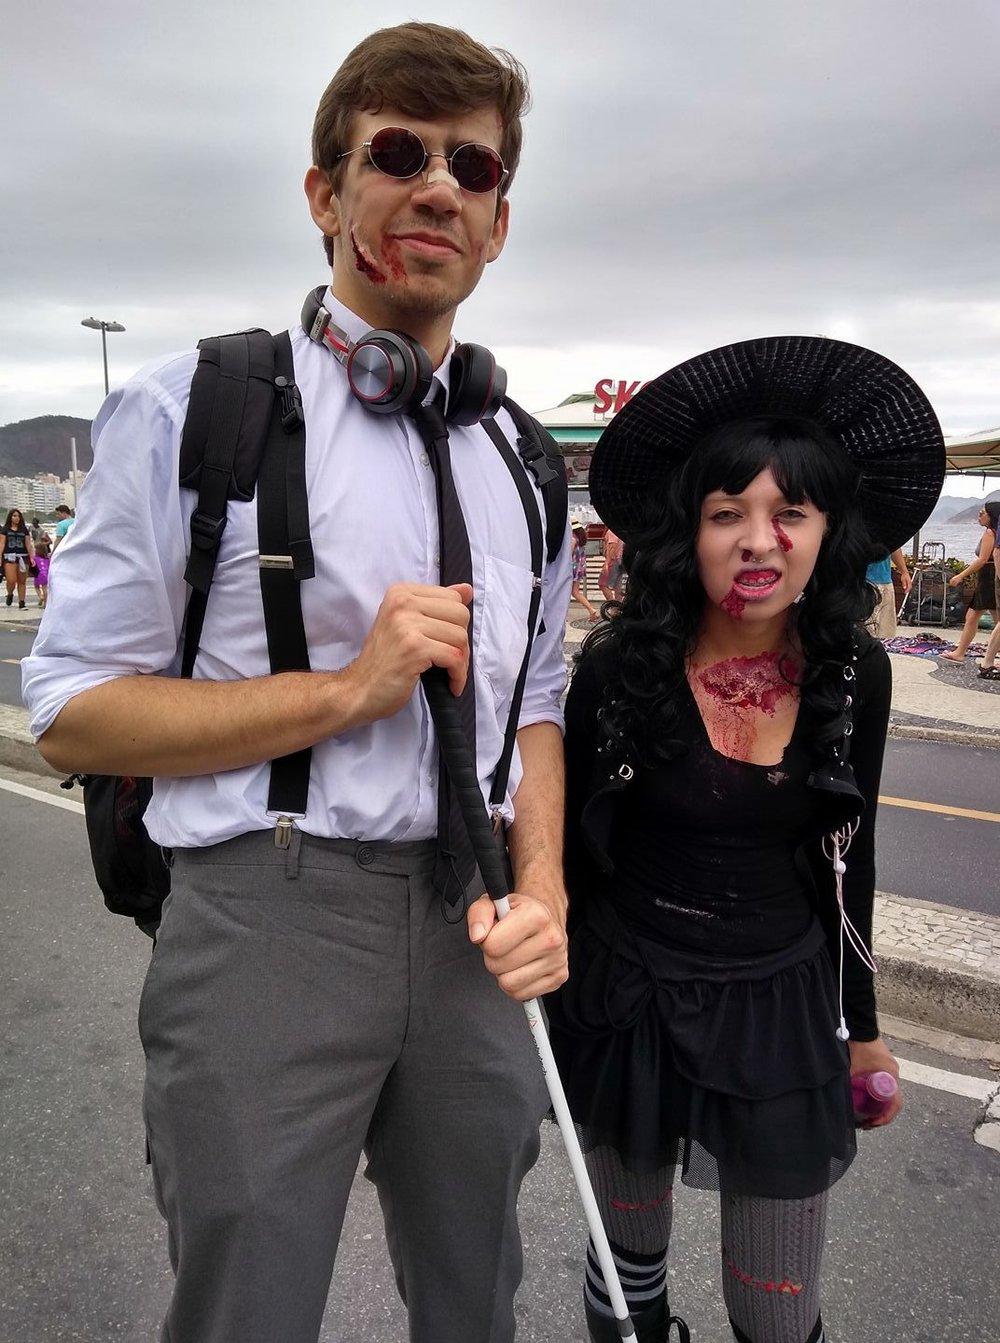 Casal de Zombies desfila na Zombie Walk 2017 na Praia de Copacabana